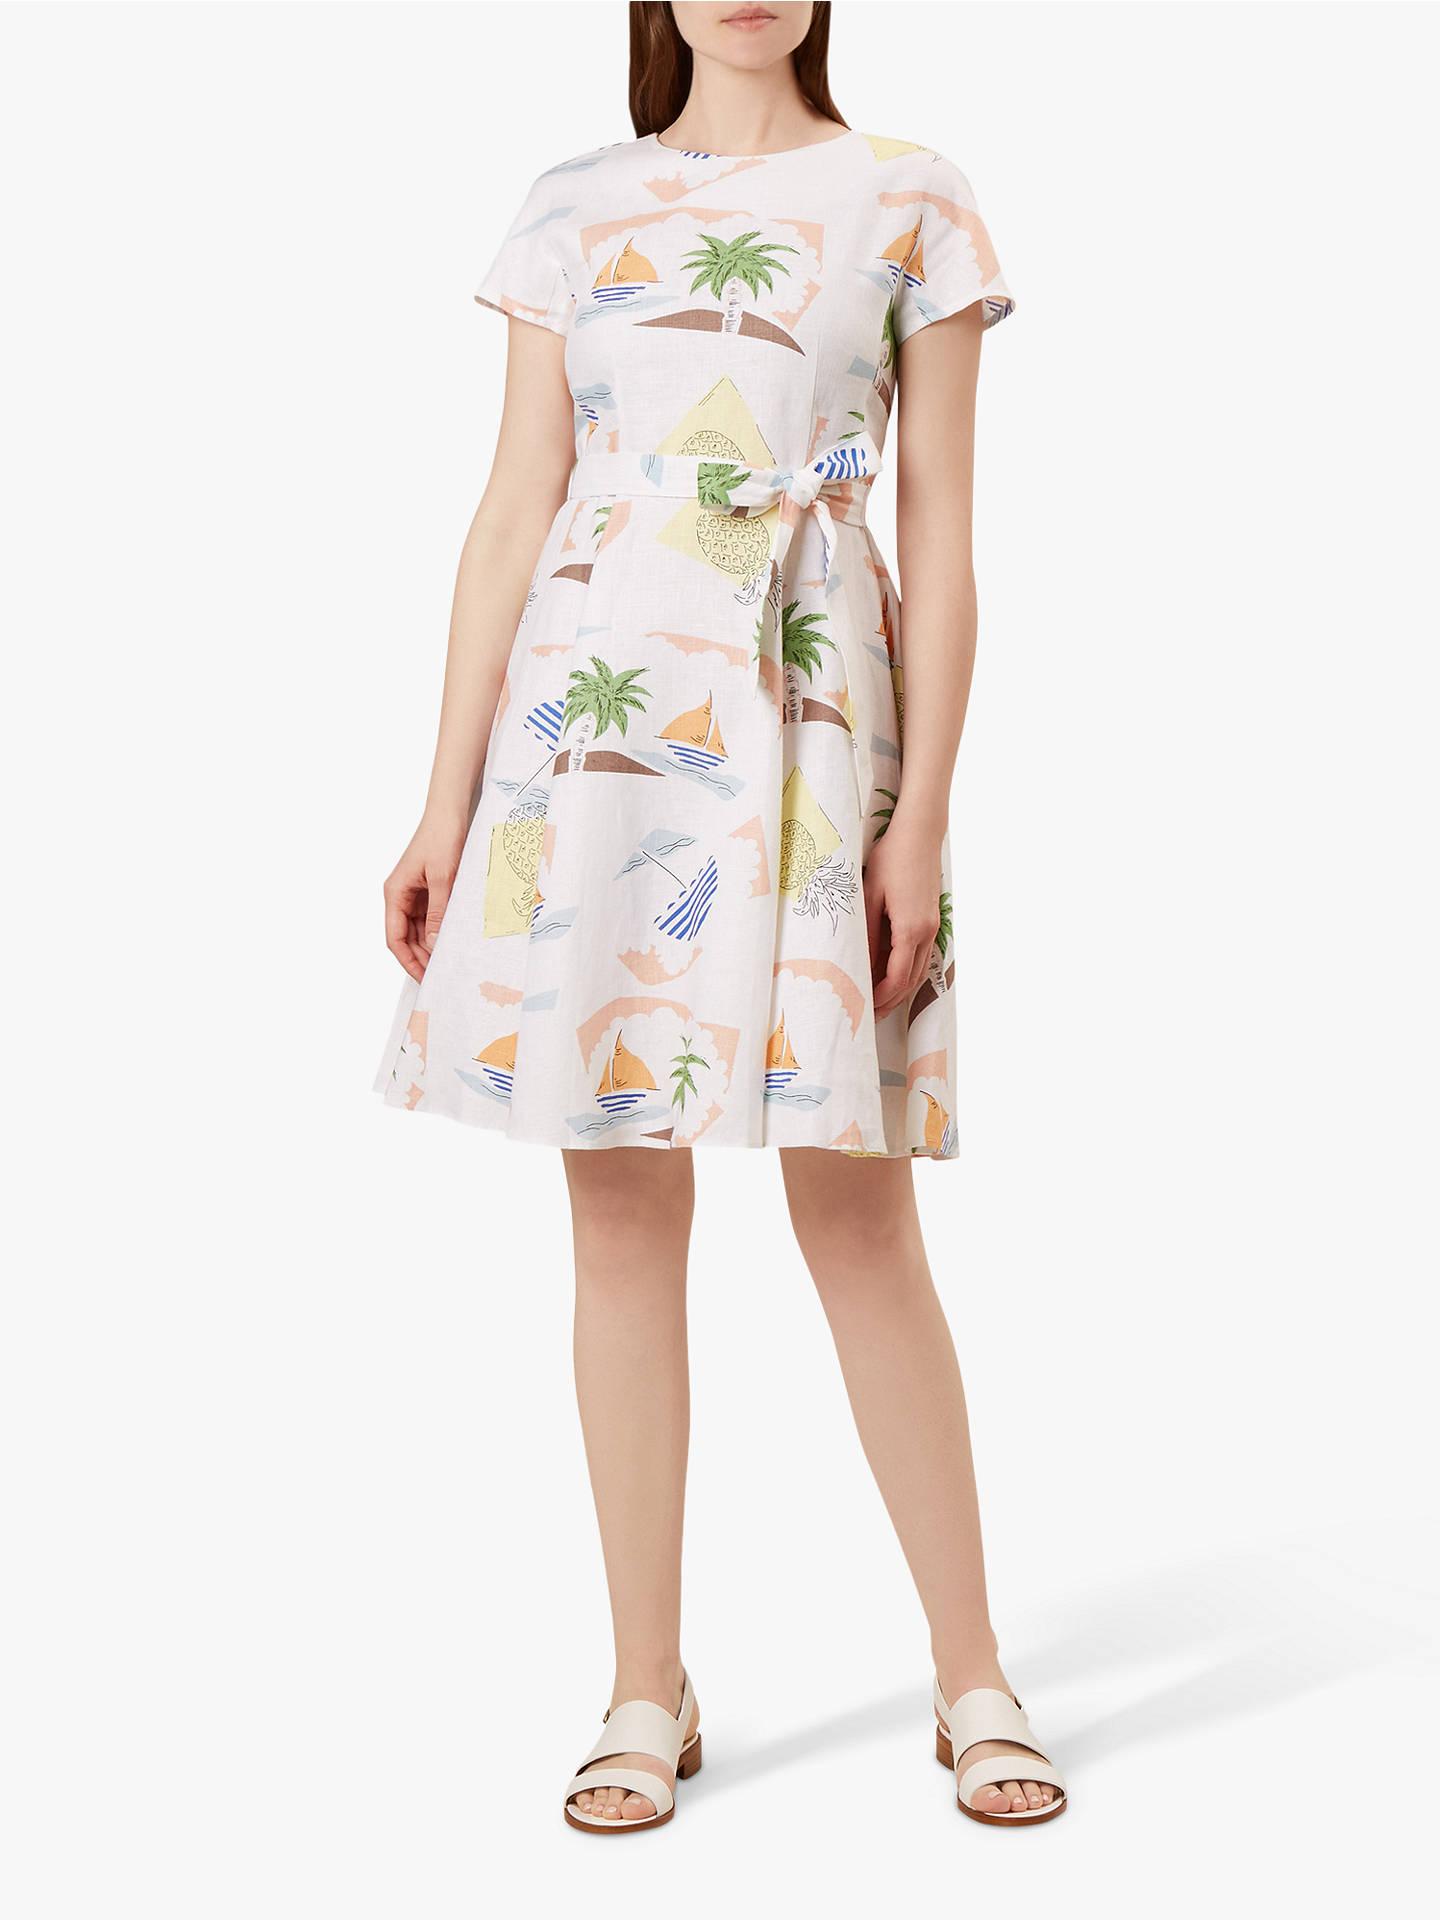 4caaff81733c7 Hobbs Sorrento Beach Print Dress, White/Multi